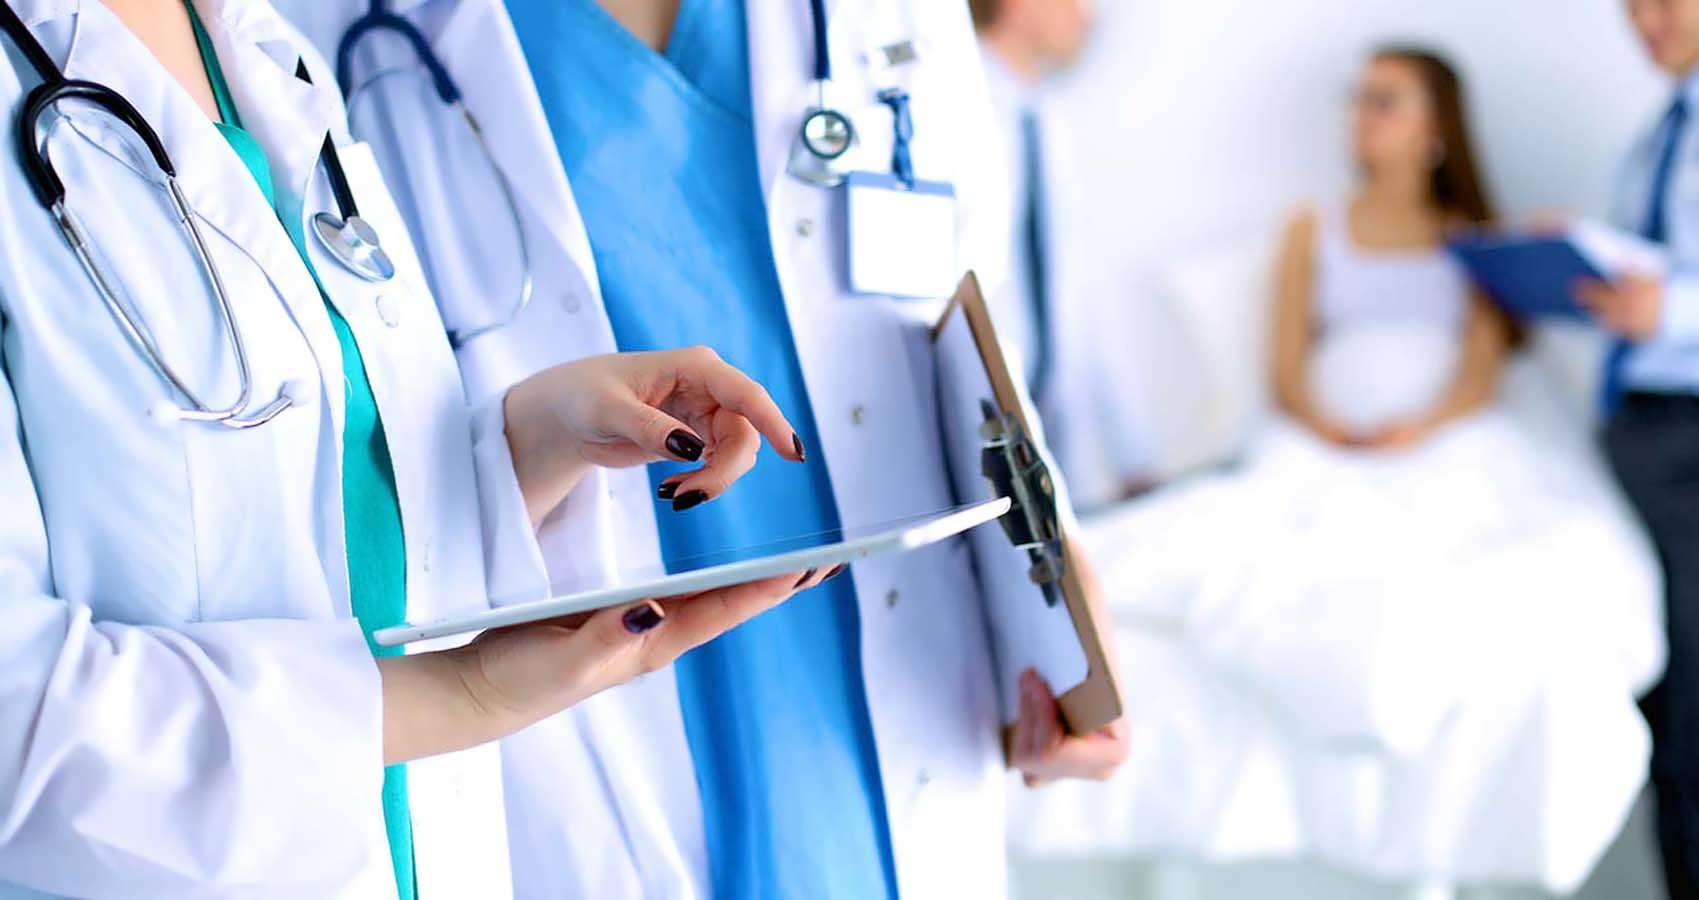 Paramedikler %40 Ek Puandan Faydalanamıyor